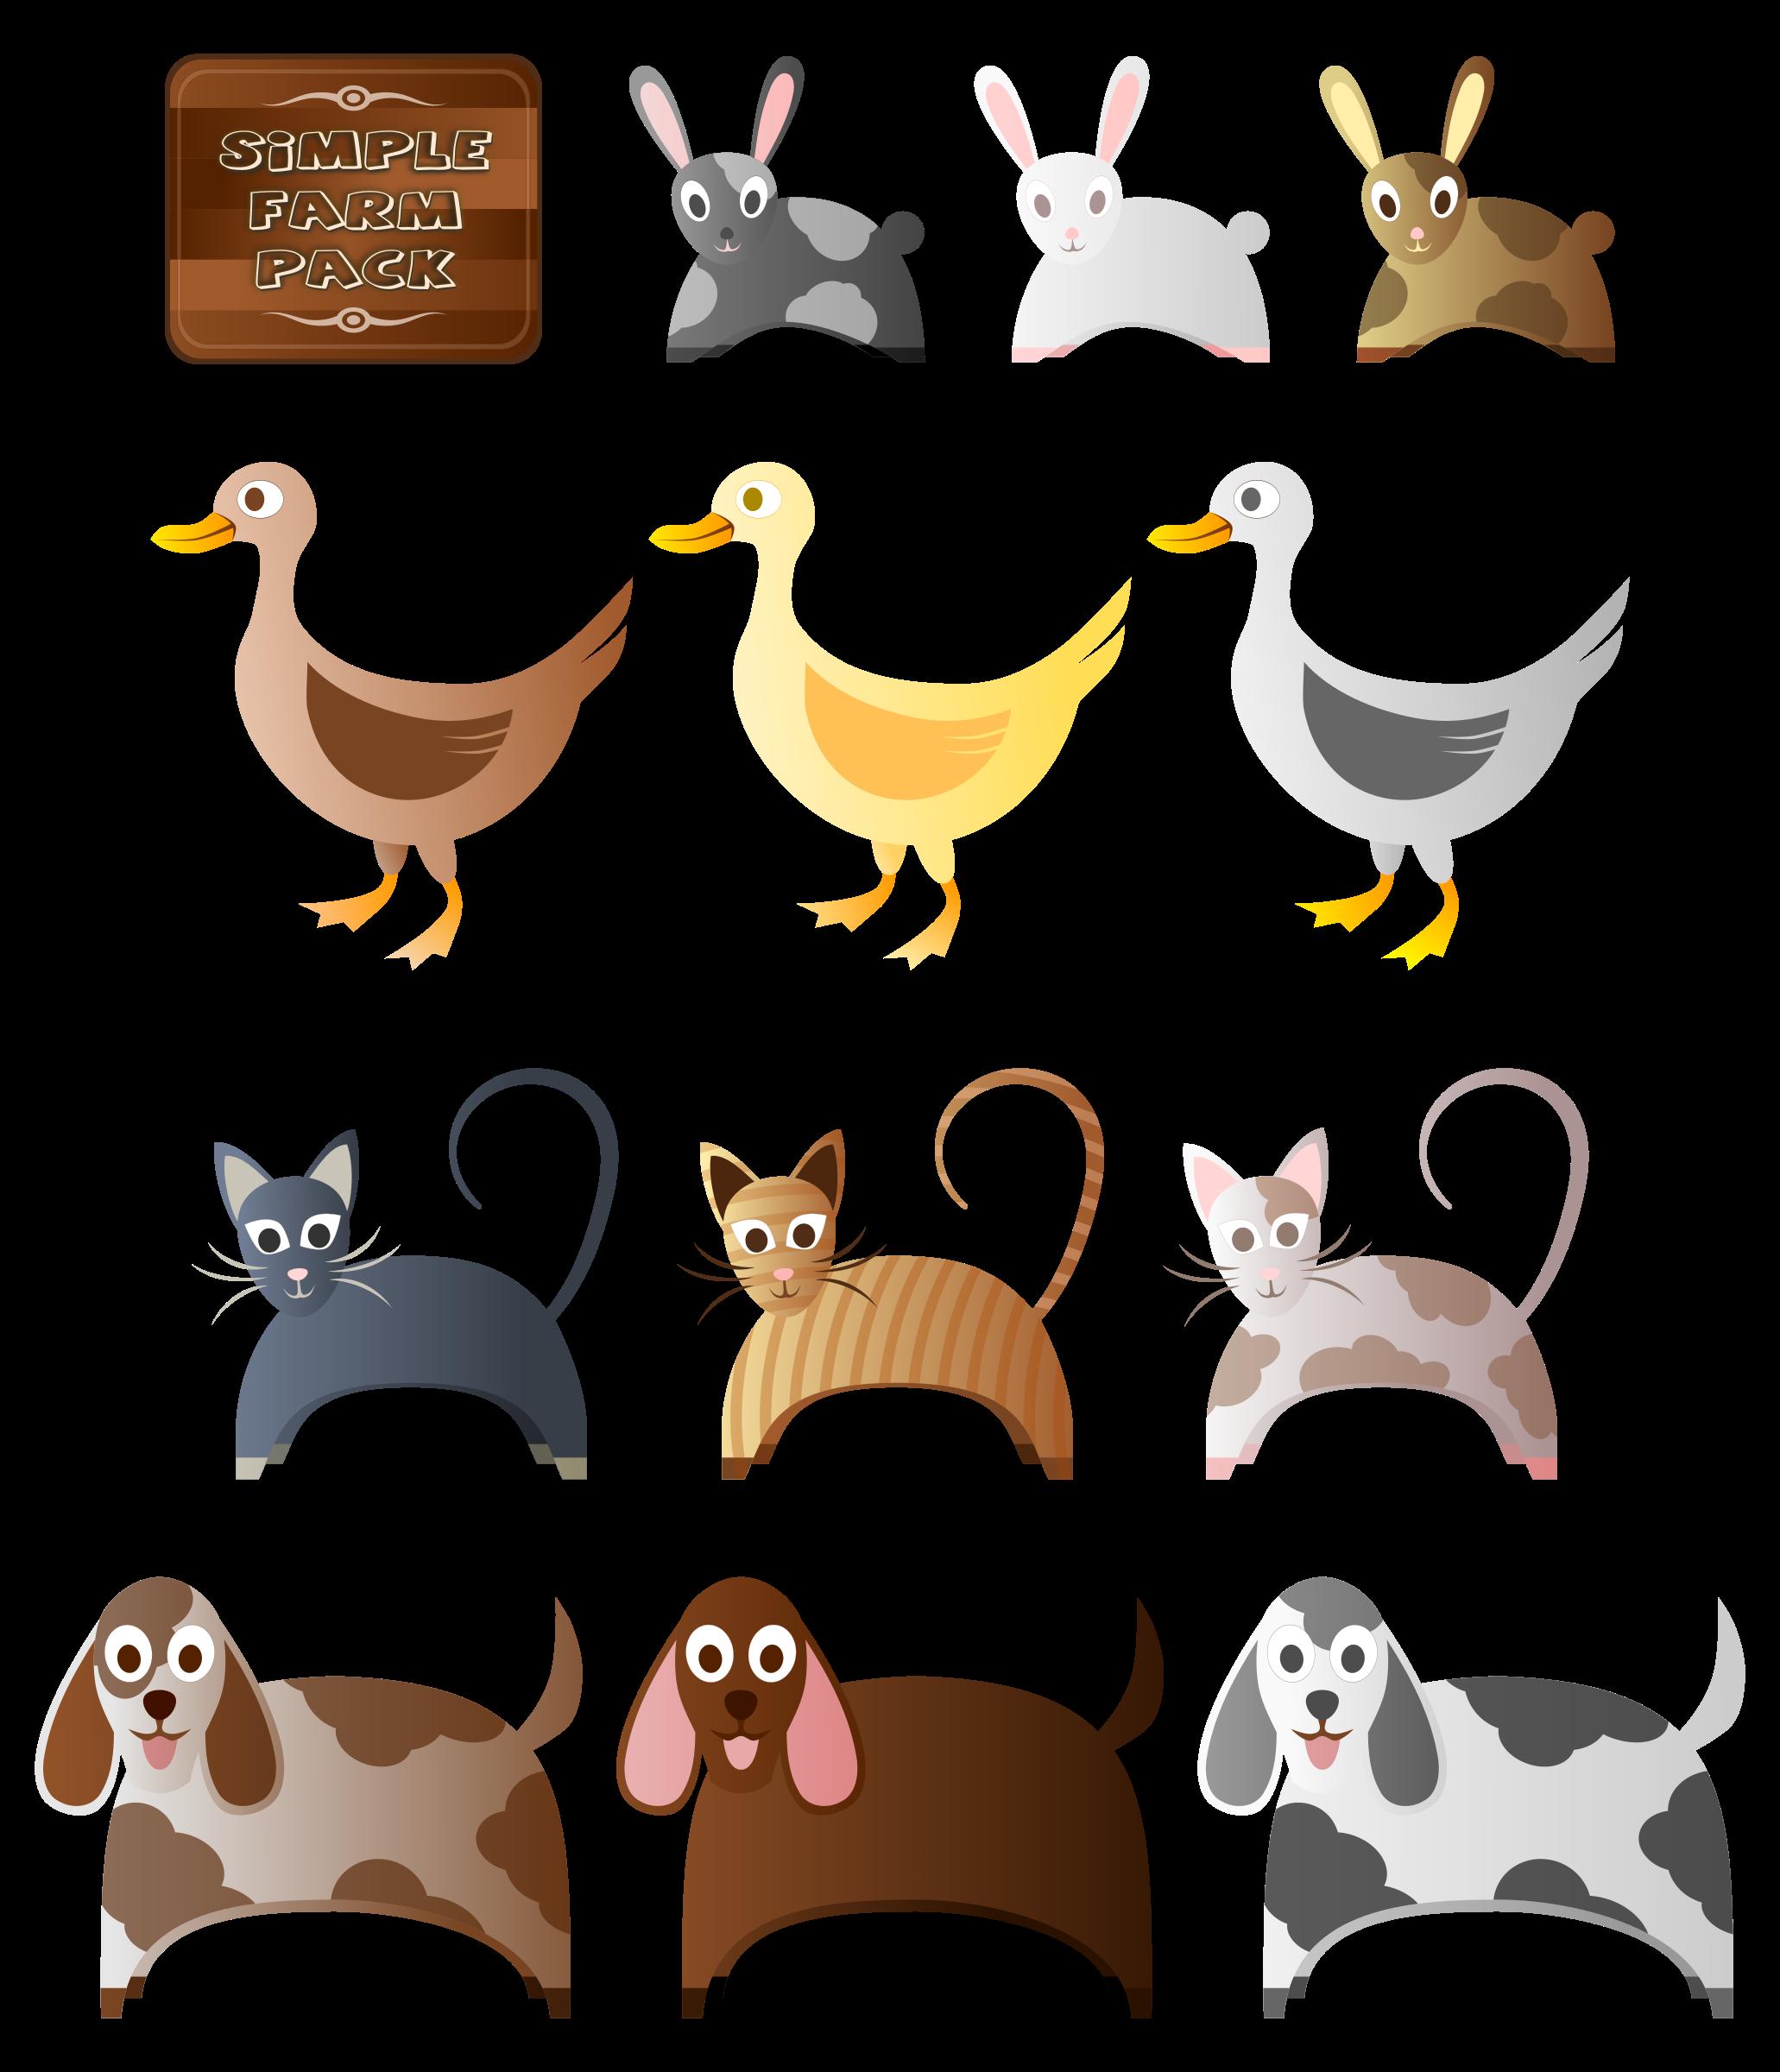 Farm big image png. Animals clipart simple